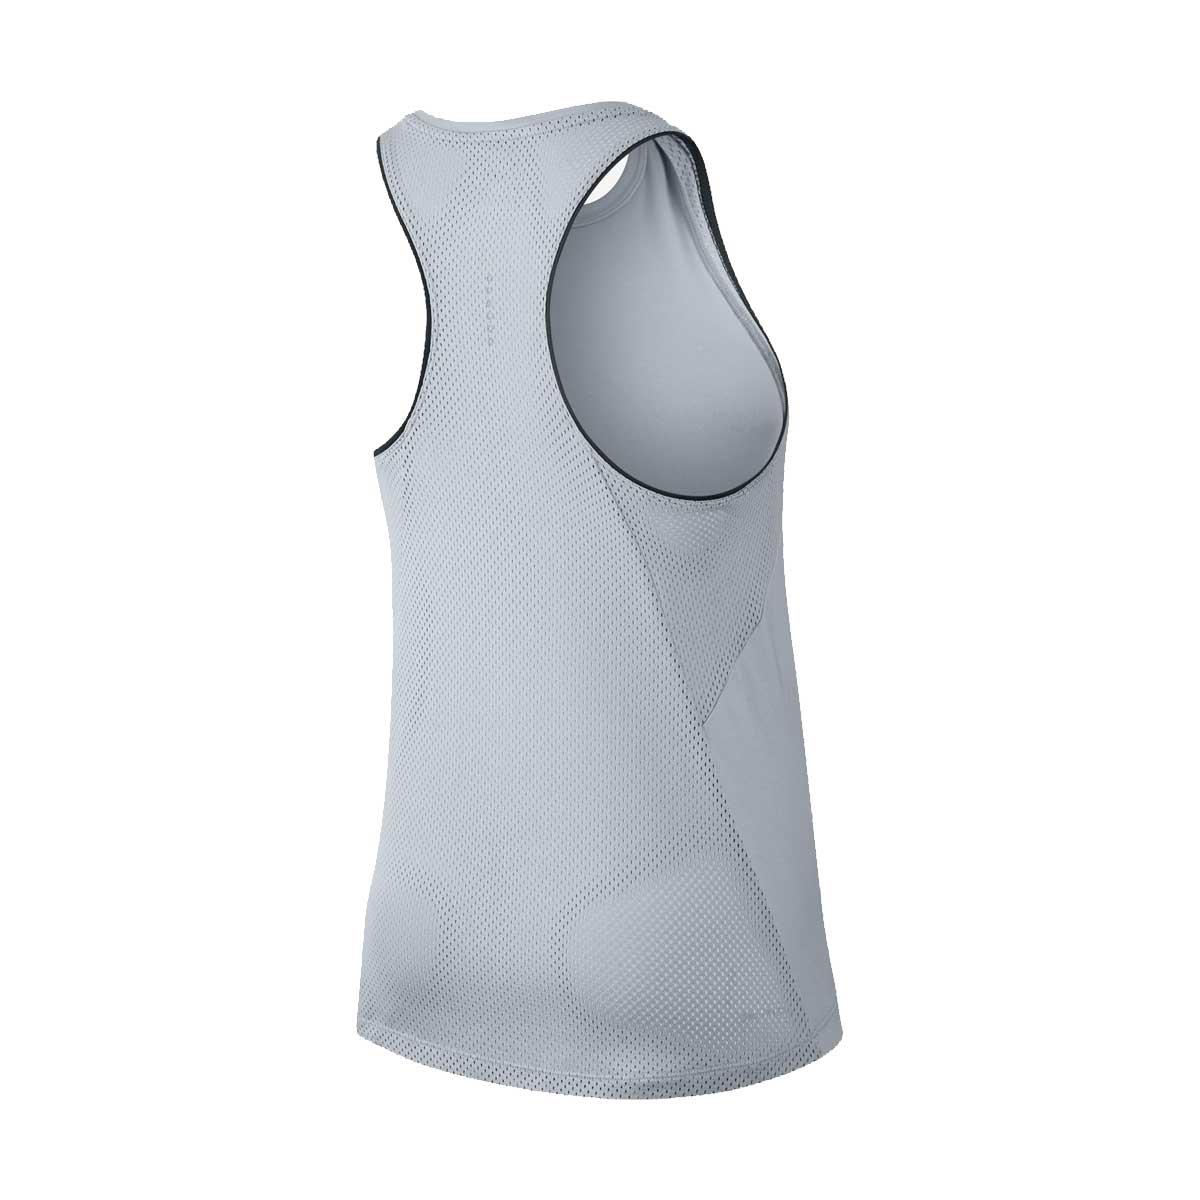 d3f684c9ee859 Camiseta Regata Nike Dry Miler Cool Feminino